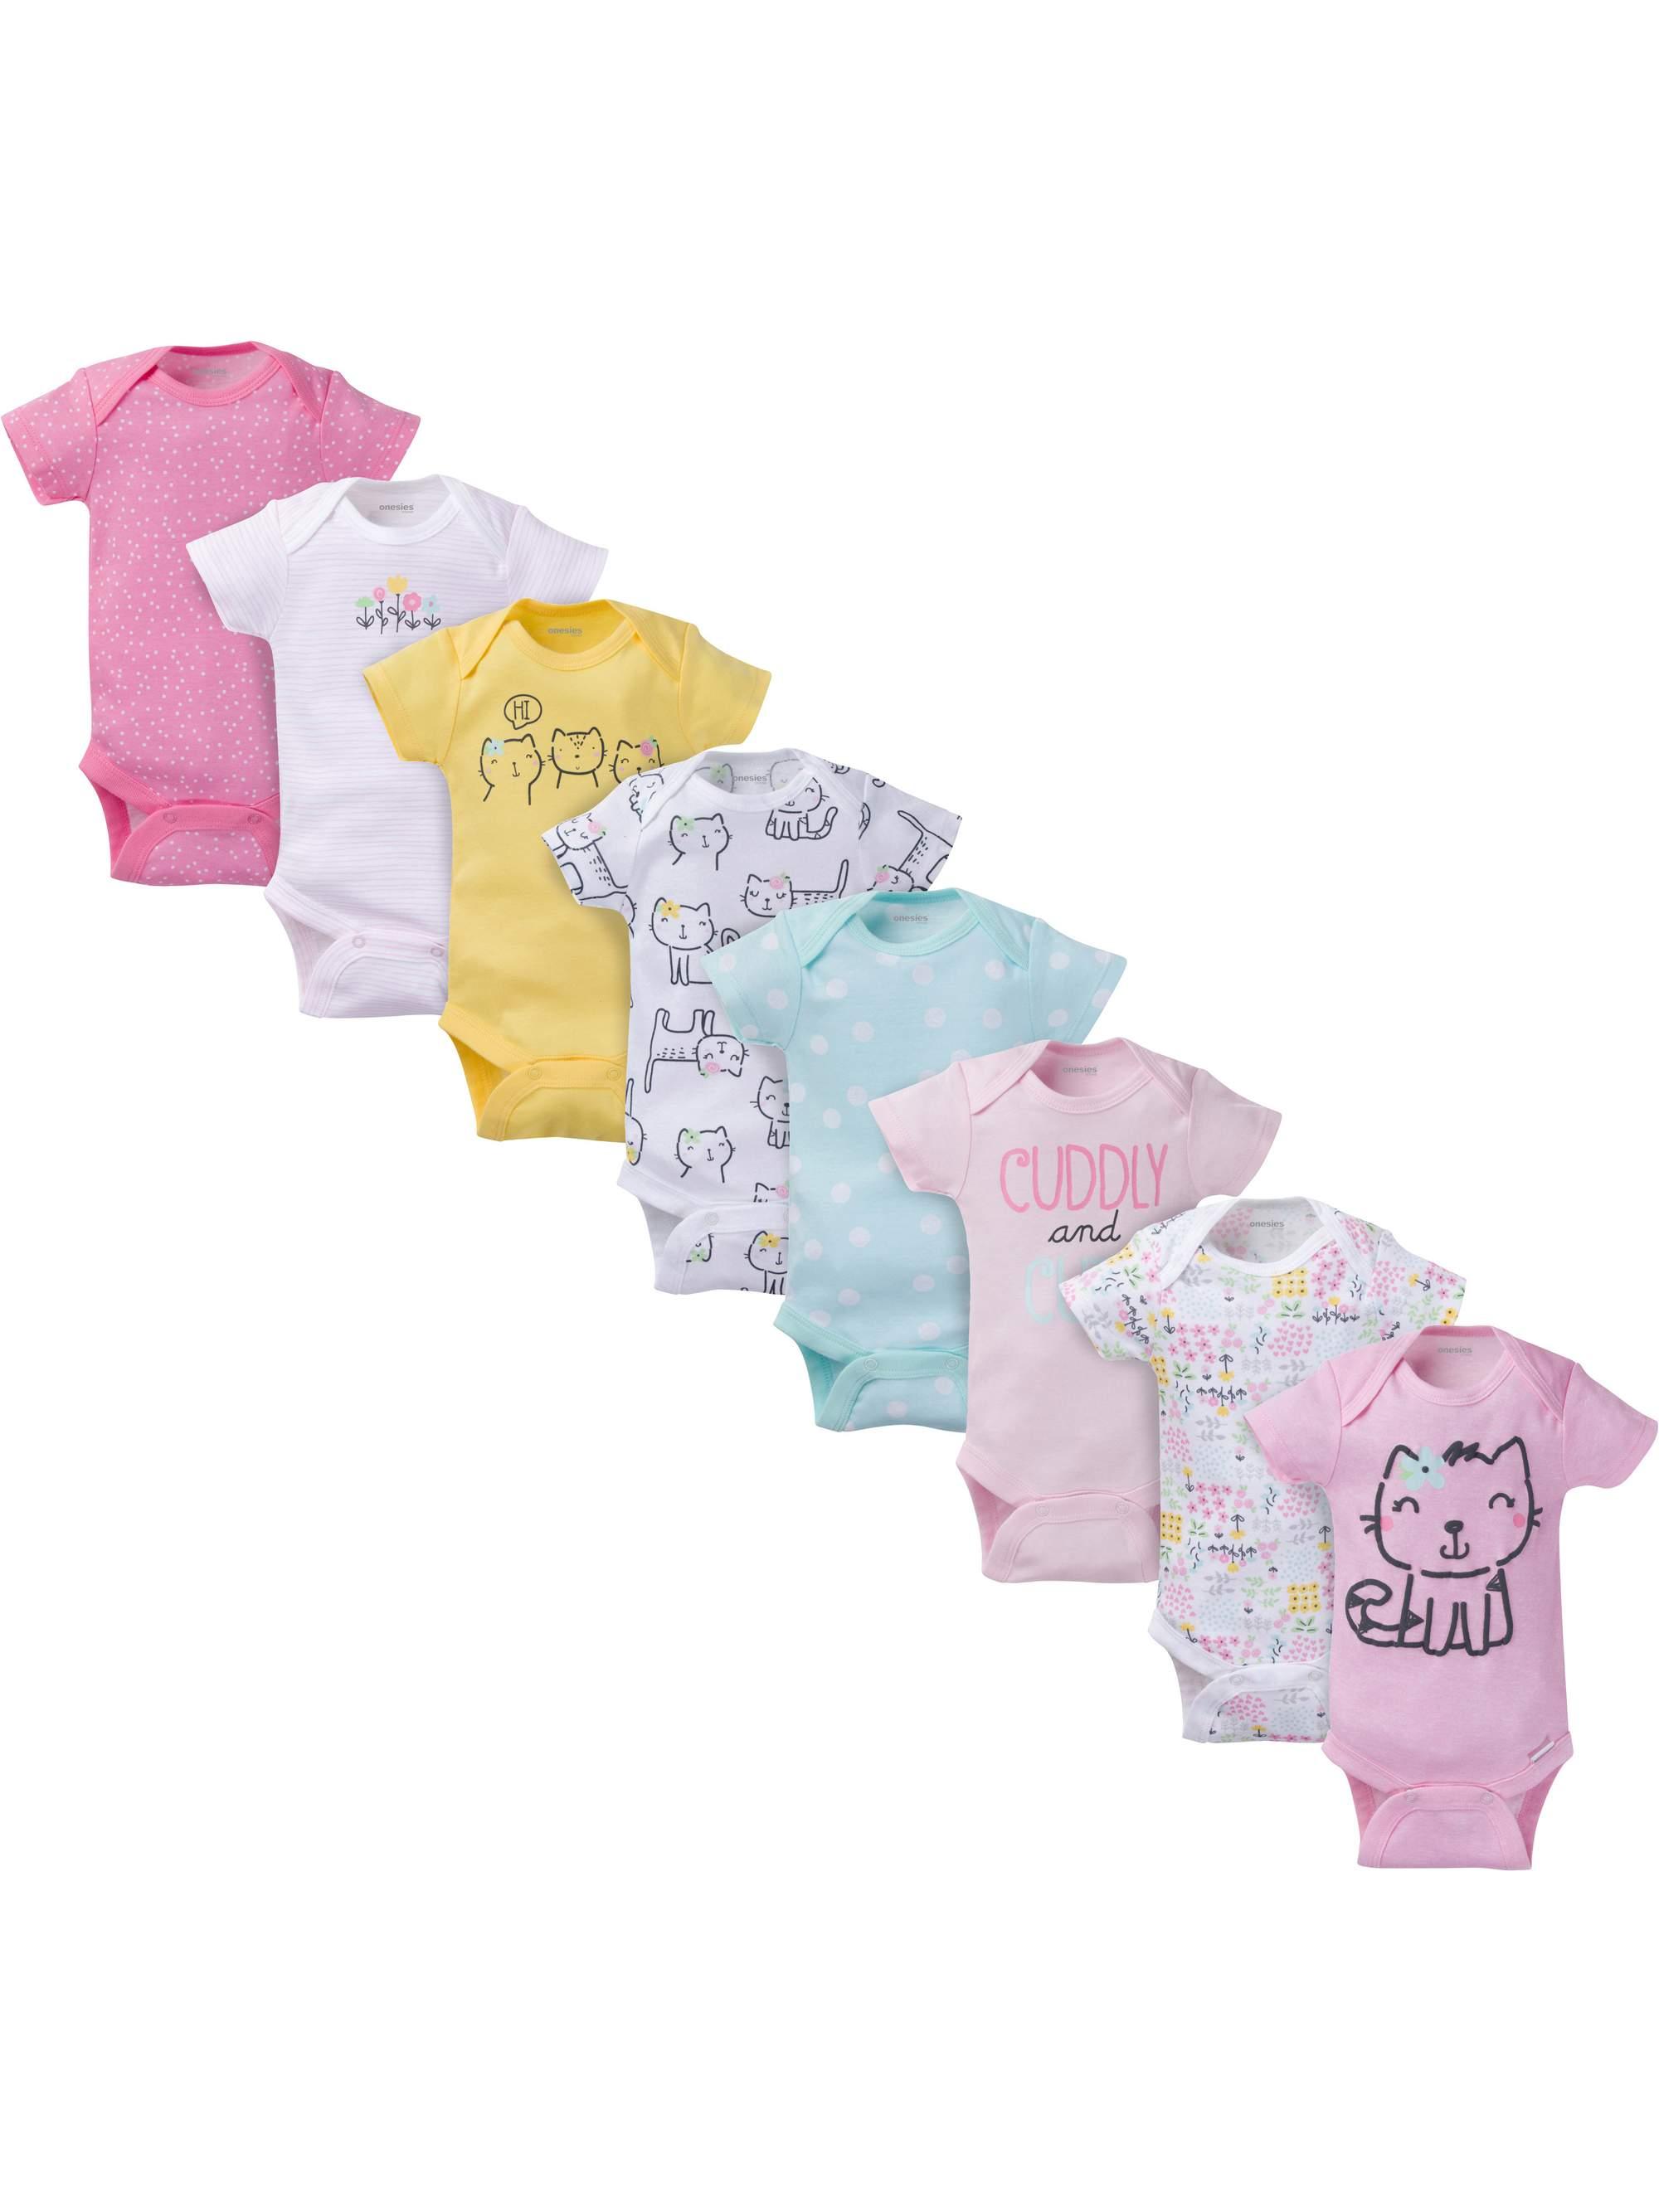 Assorted Short Sleeve Bodysuits Set, 8pk (Baby Girl)